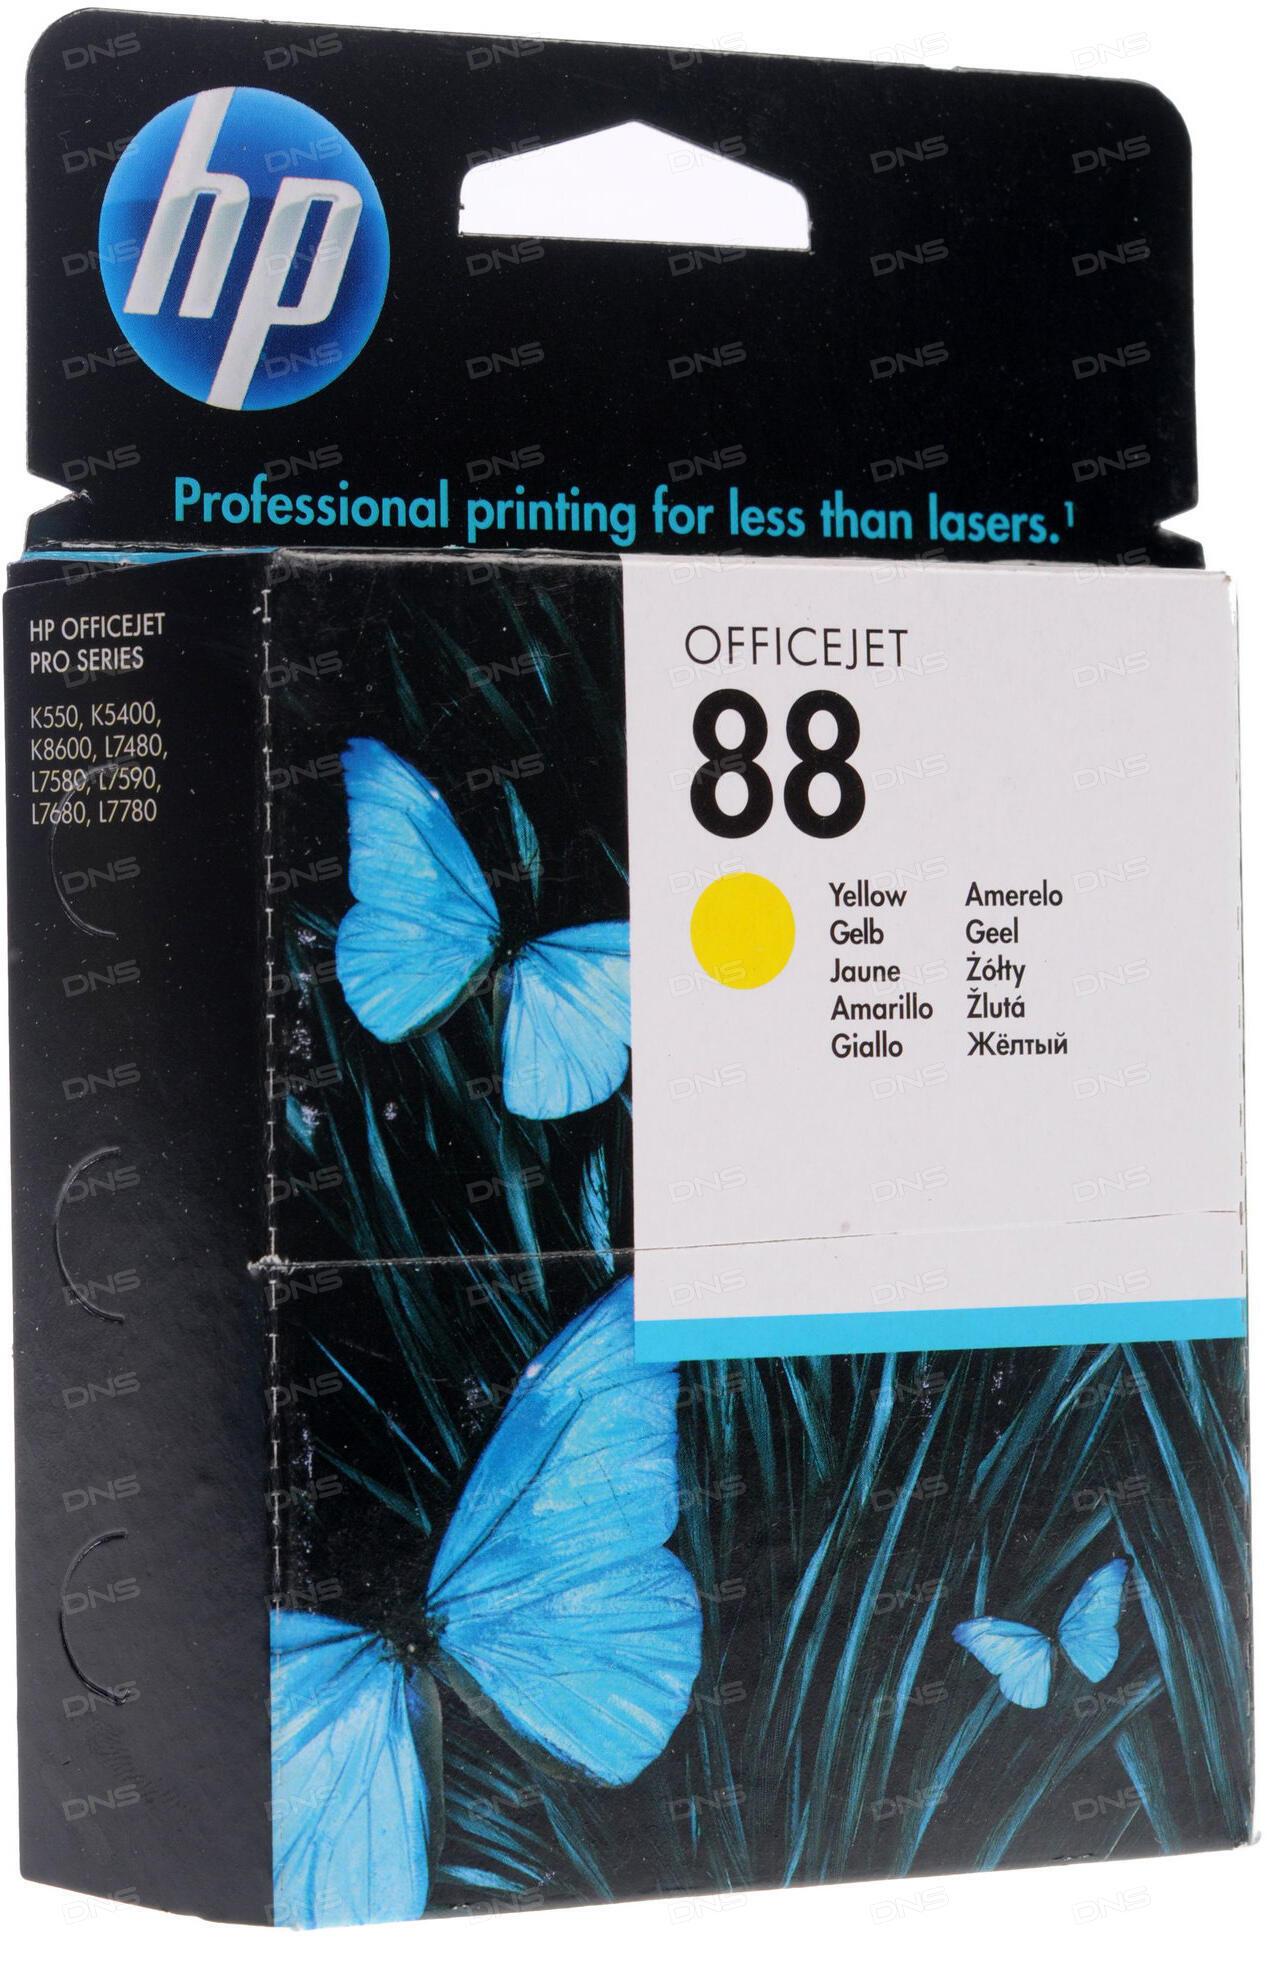 Картридж струйный HP 88XL C9396AE Black для K550/K5400/K8600 (69 Мл)